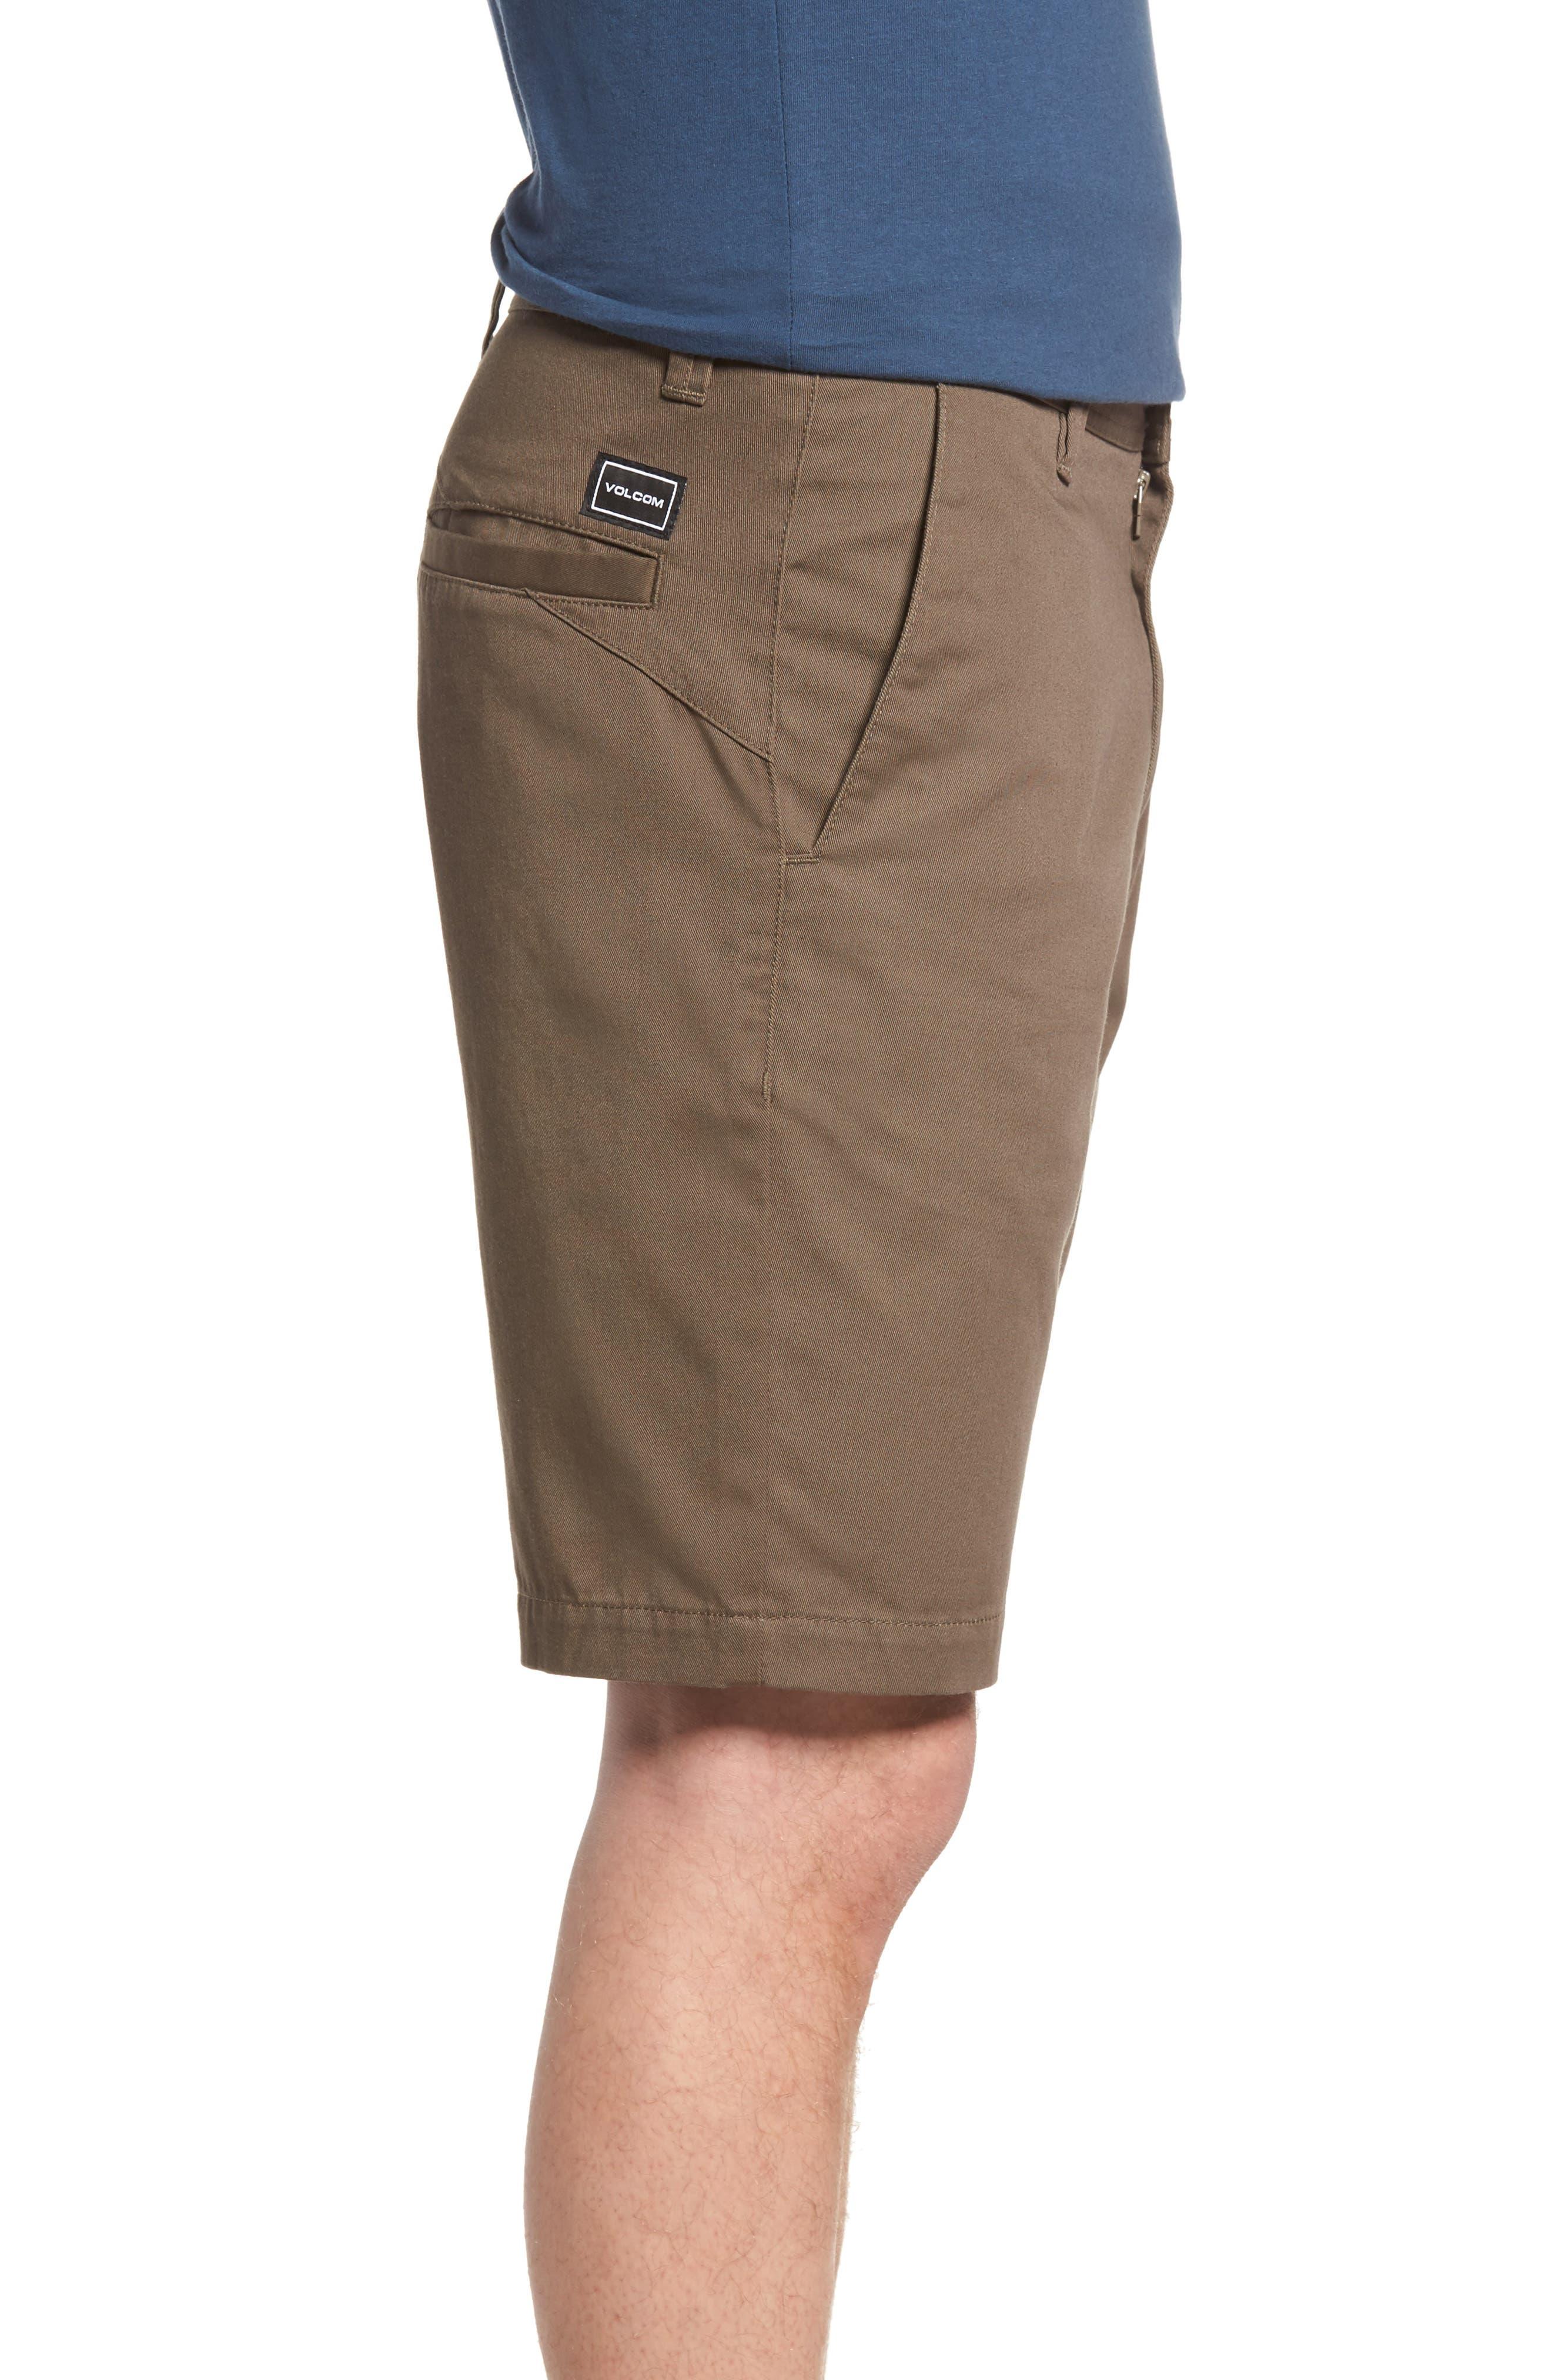 Drifter Modern Chino Shorts,                             Alternate thumbnail 3, color,                             Mushroom